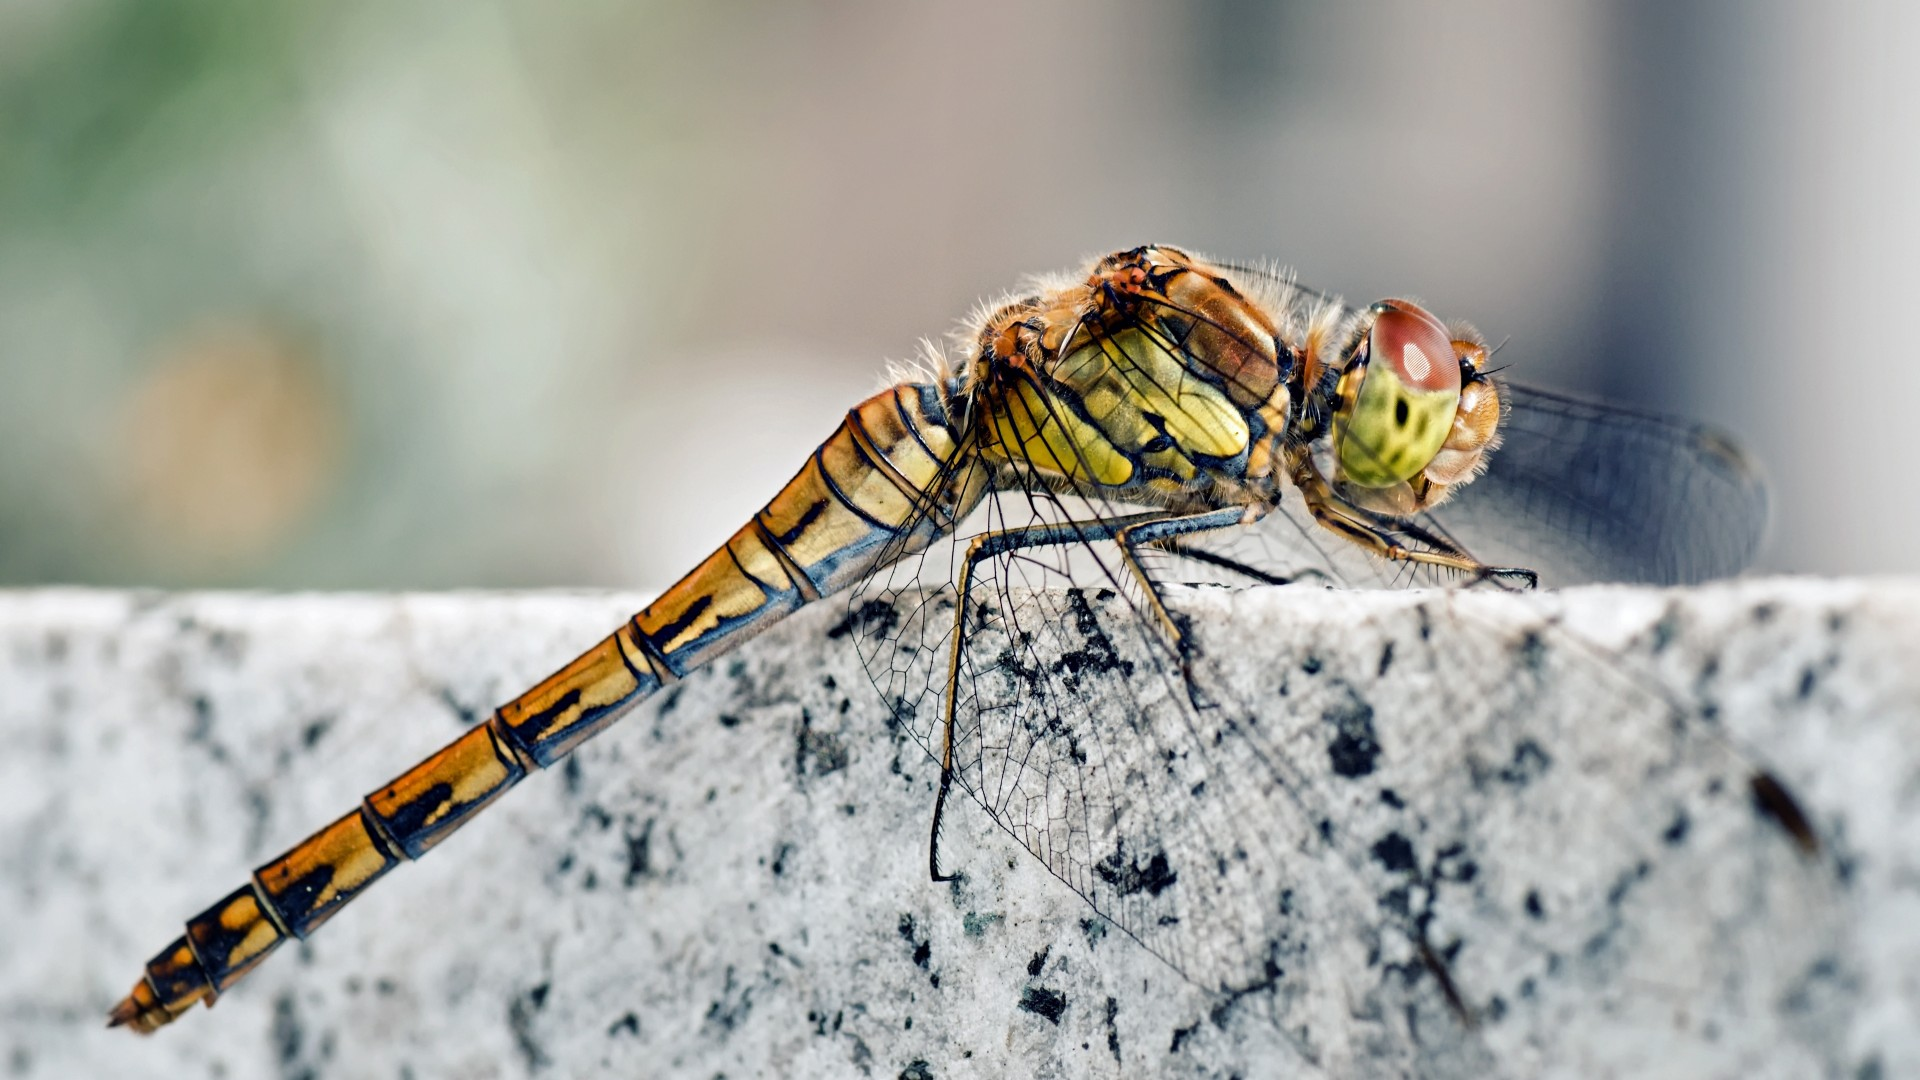 Eyes Of A Dragonfly Nature Dew Cute Macro Hd Wallpaper: Wallpaper Dragonfly, Macro Insects Photography, Wings